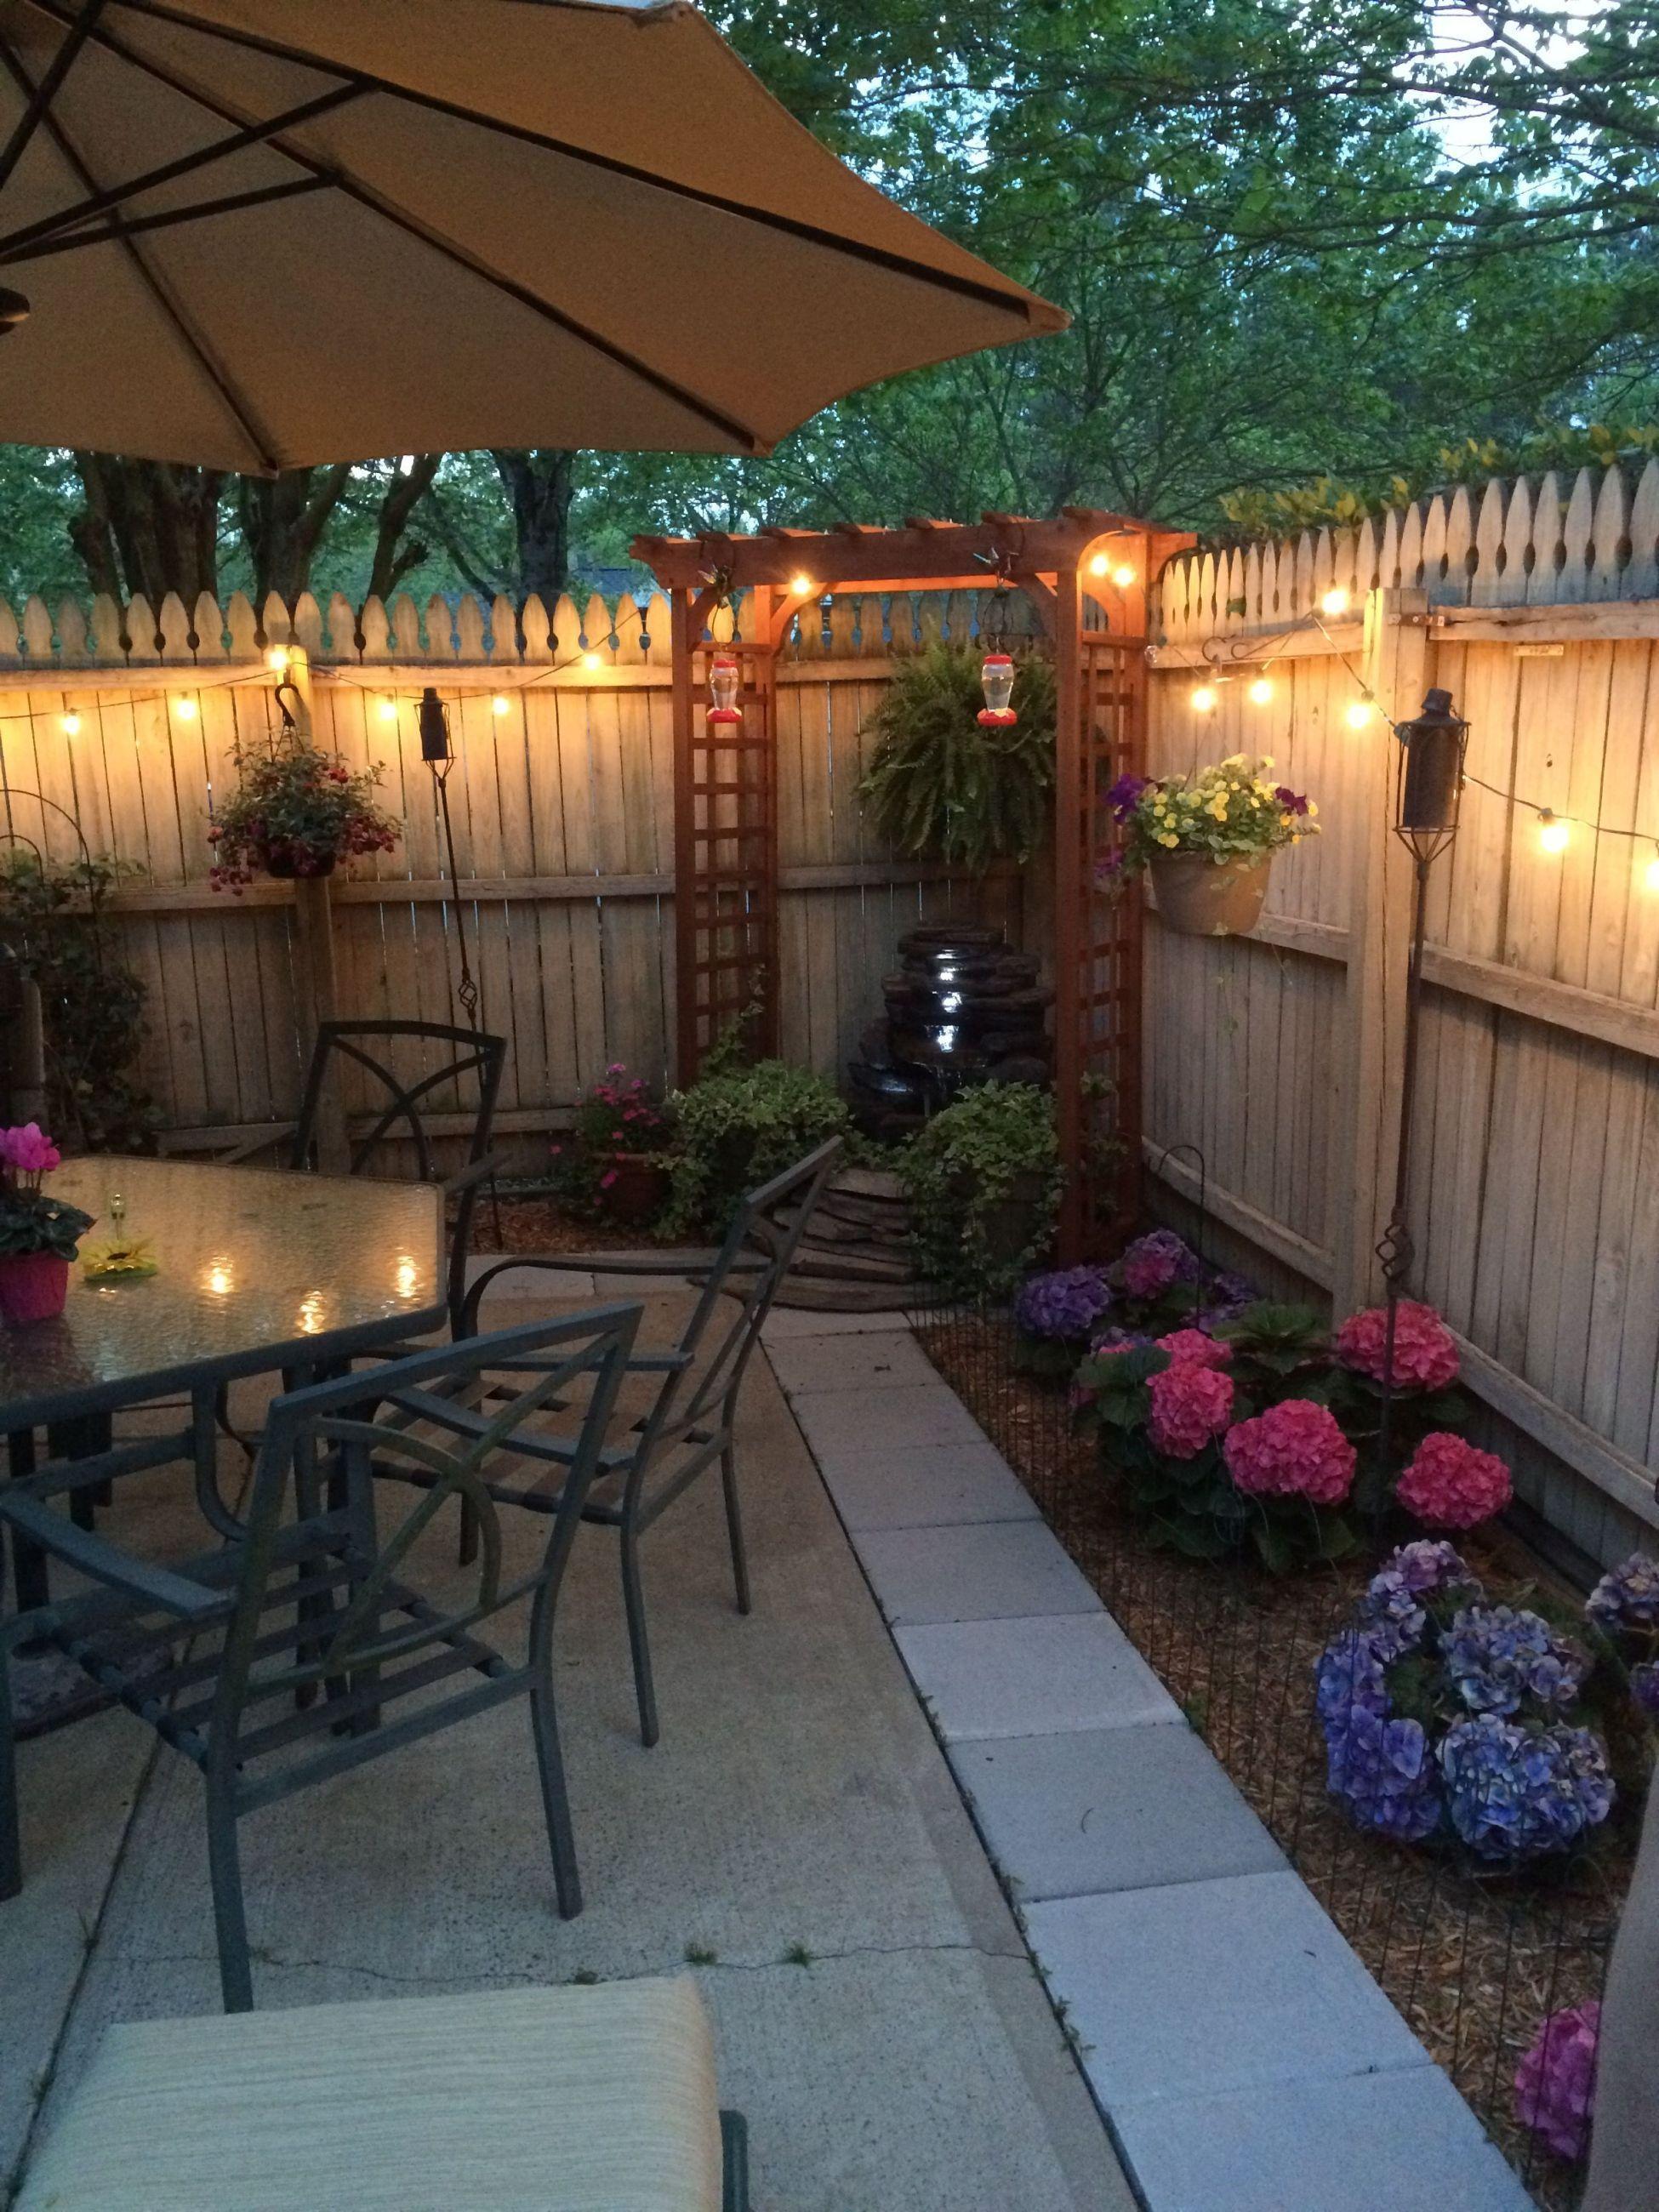 60 Small Backyard Landscaping Ideas With Rocks Pool On A Budget Backyard Landscaping Designs Diy Backyard Patio Backyard Seating